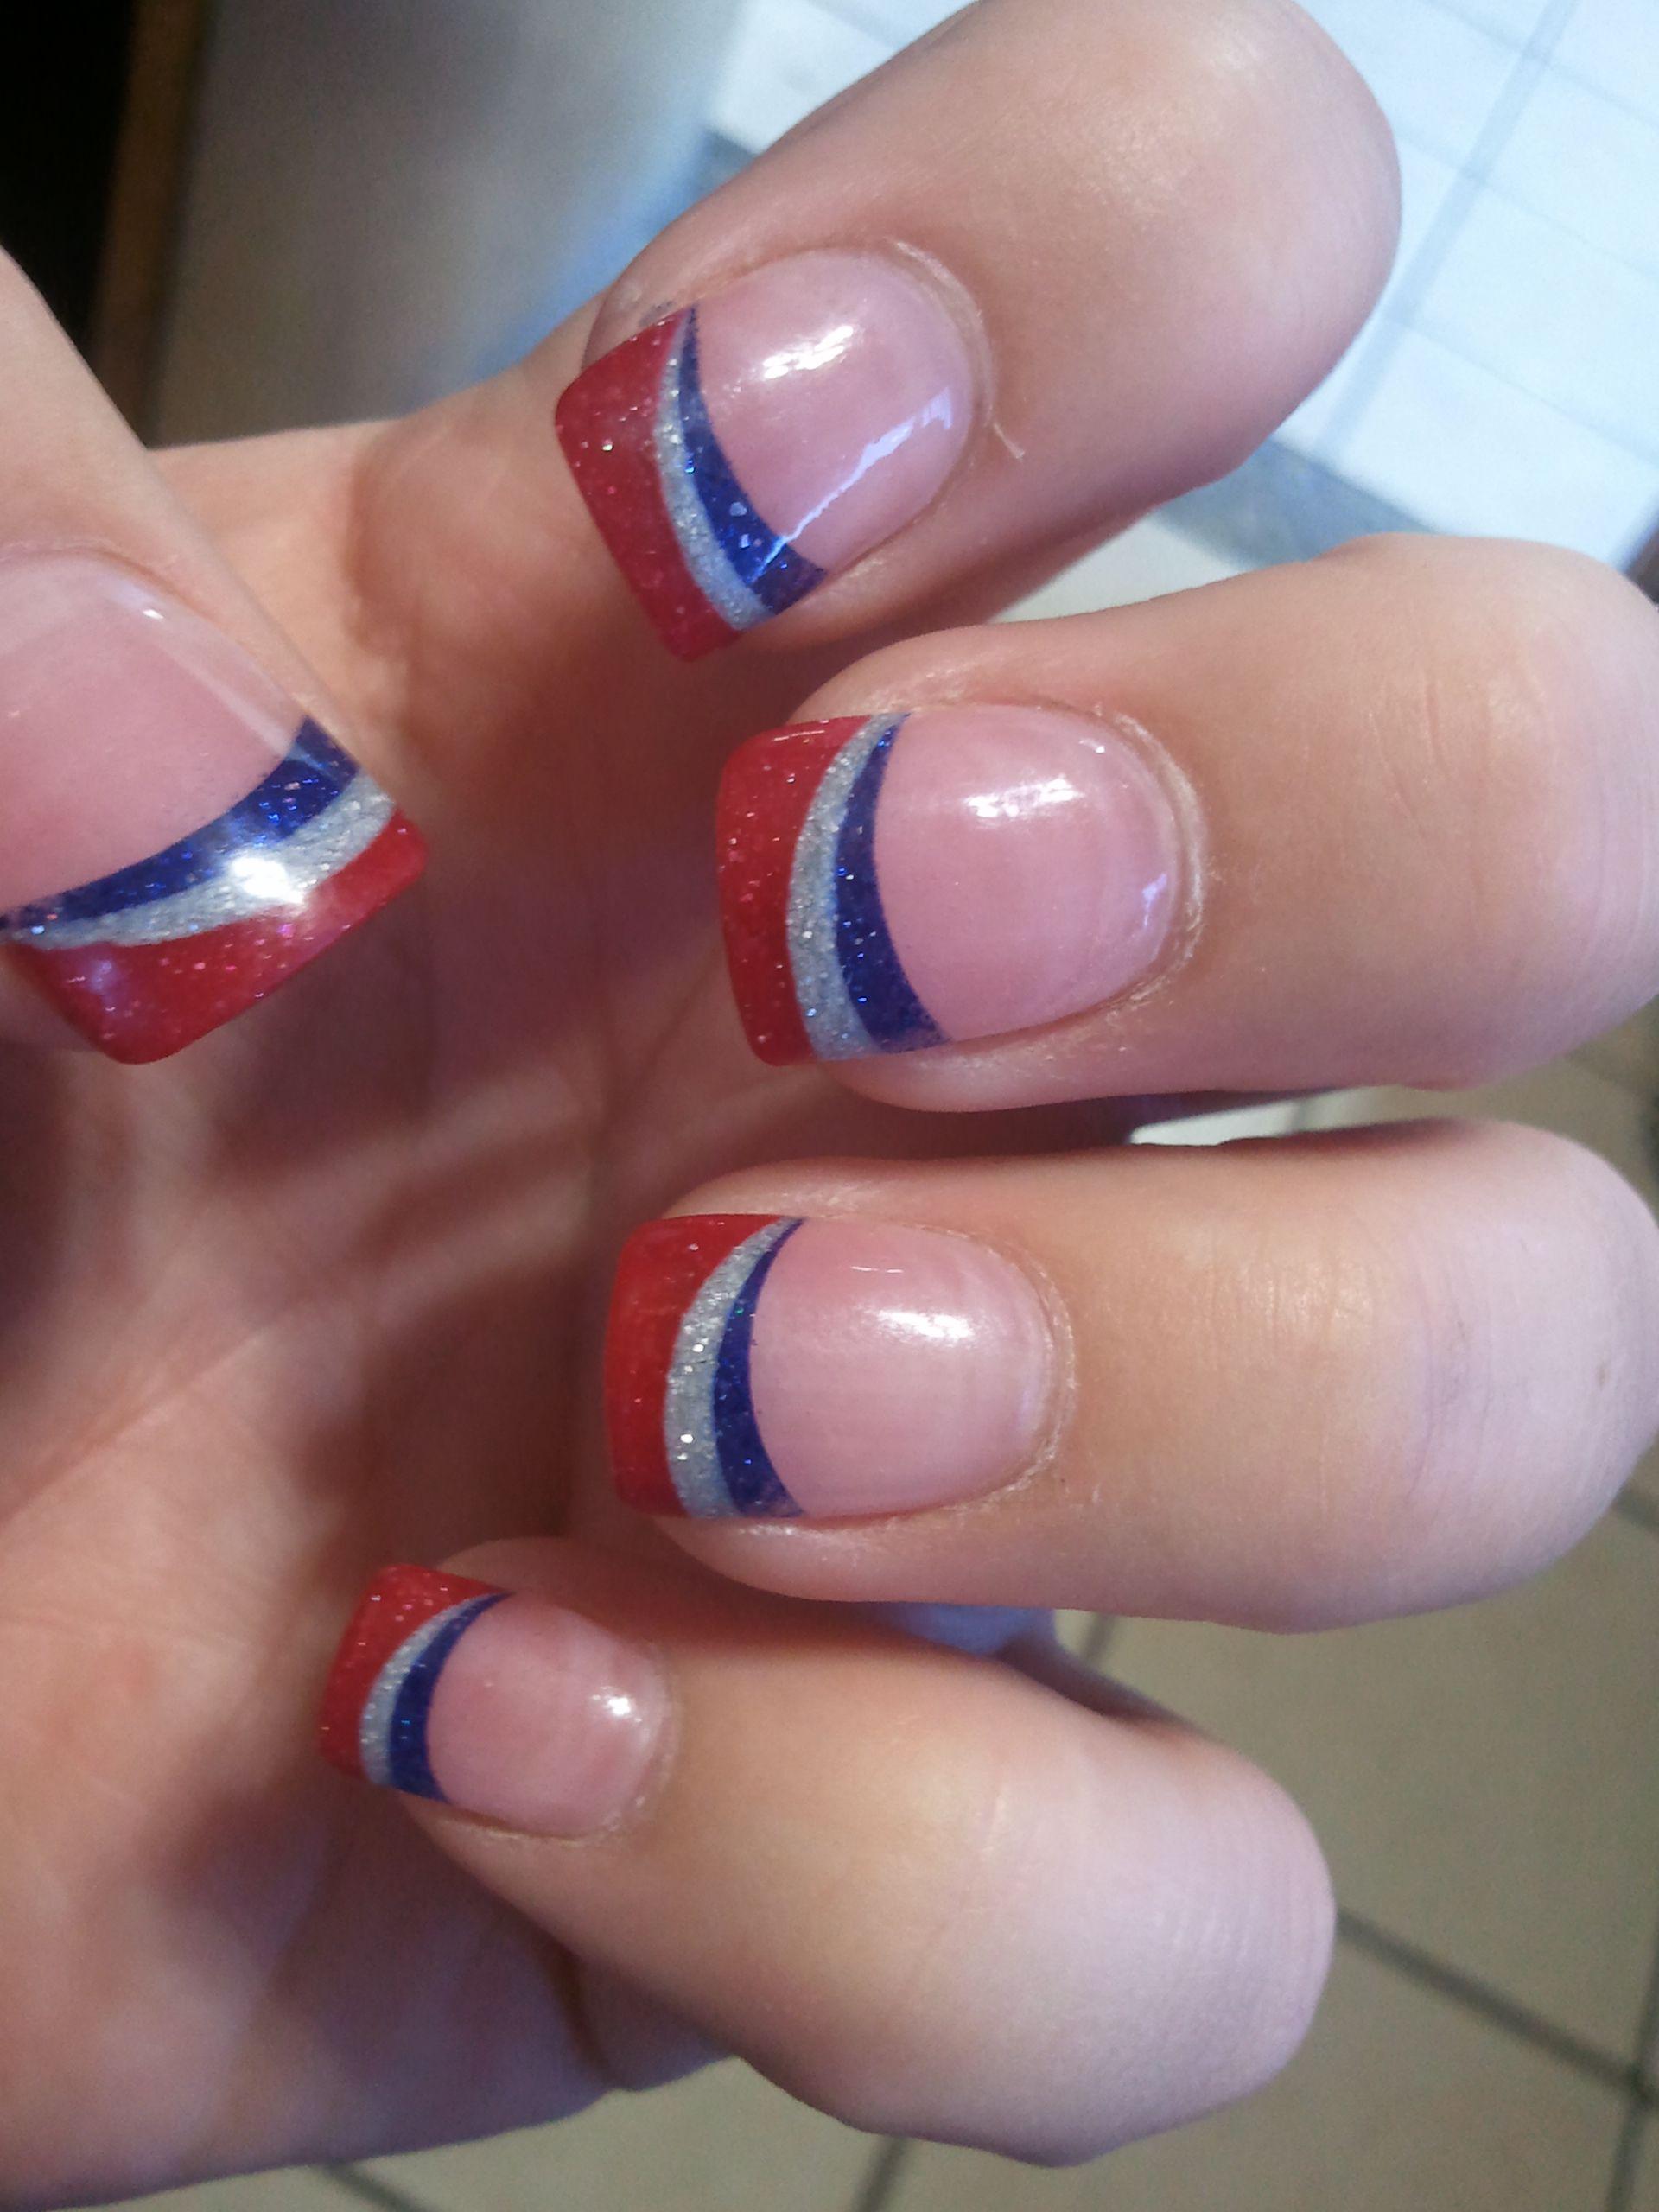 Support Norwood with Red White Blue Fingernails! | fingernails ...